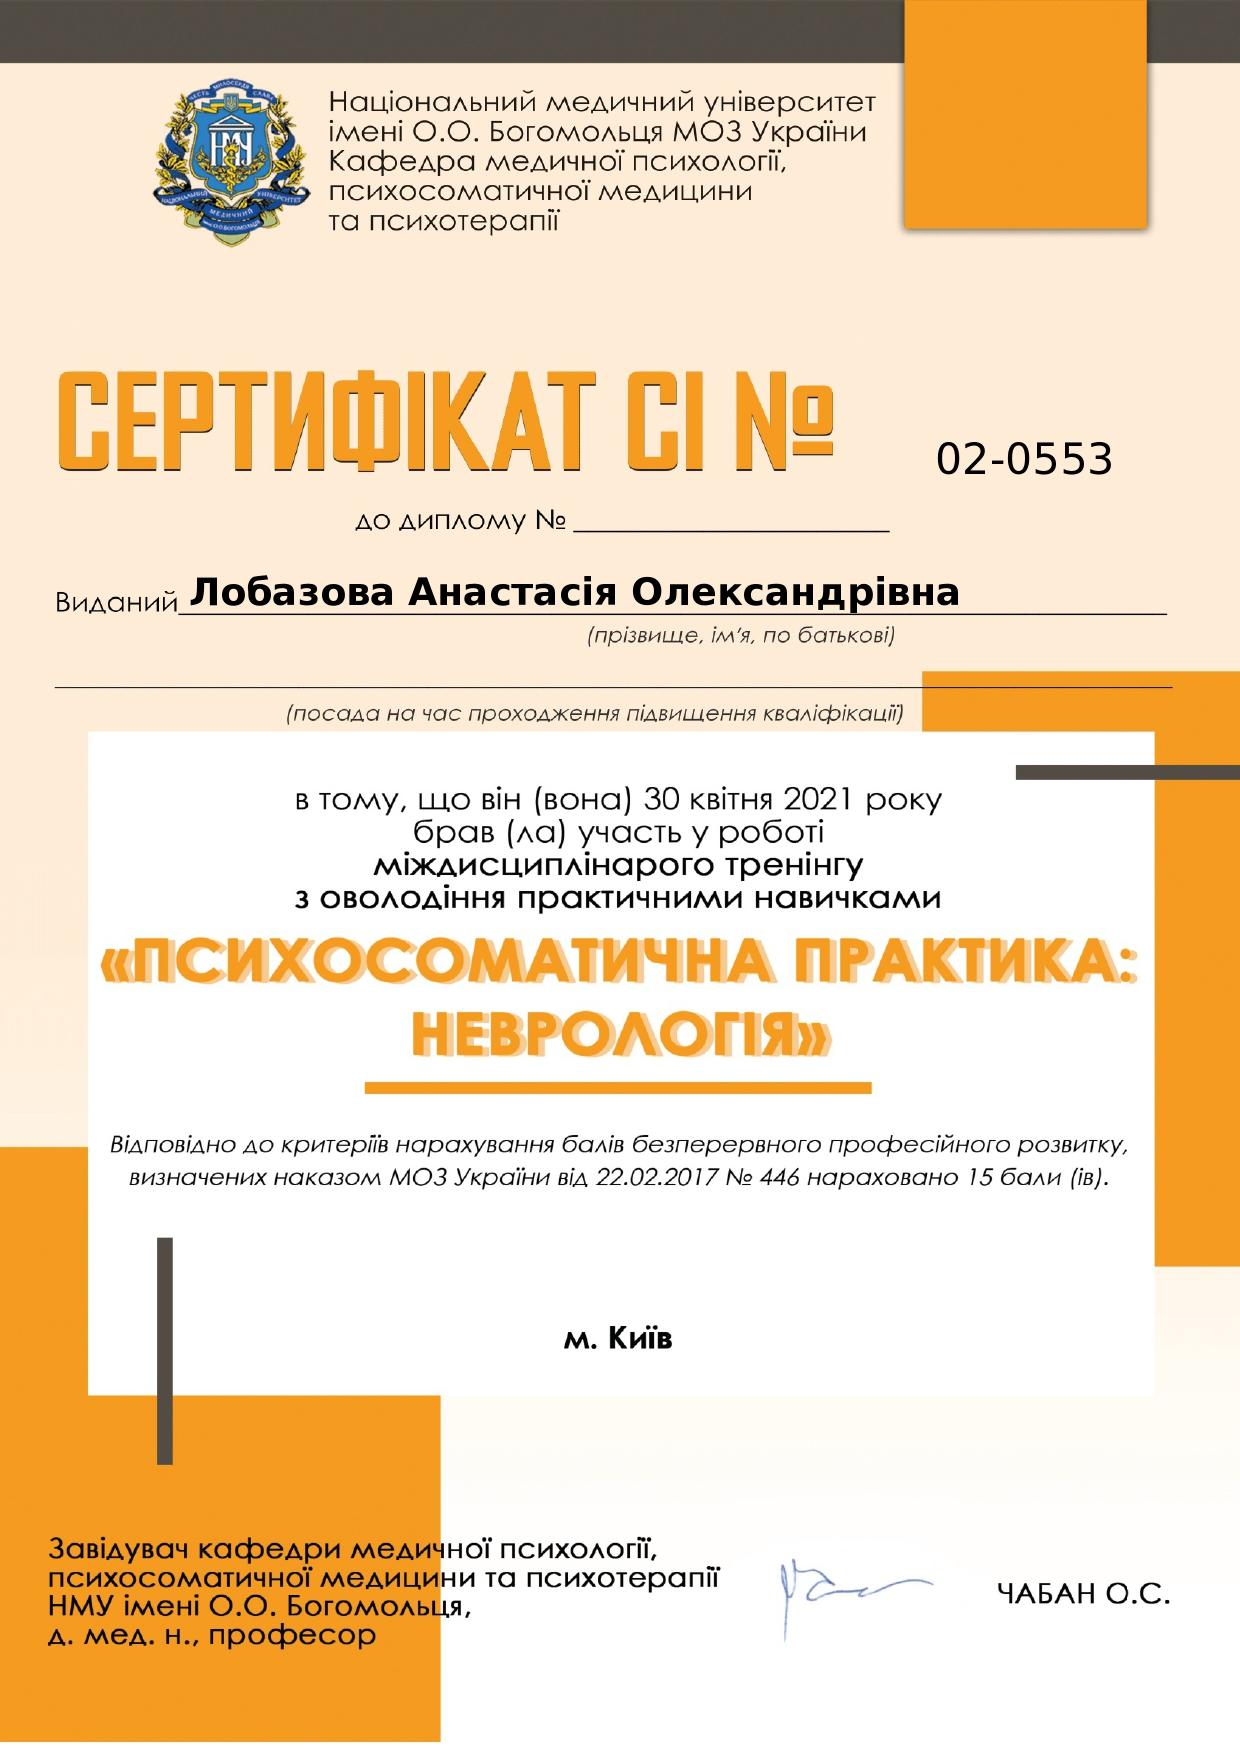 Лобазова Анастасія Олександрівна (9654210) - Certificate_page-0001